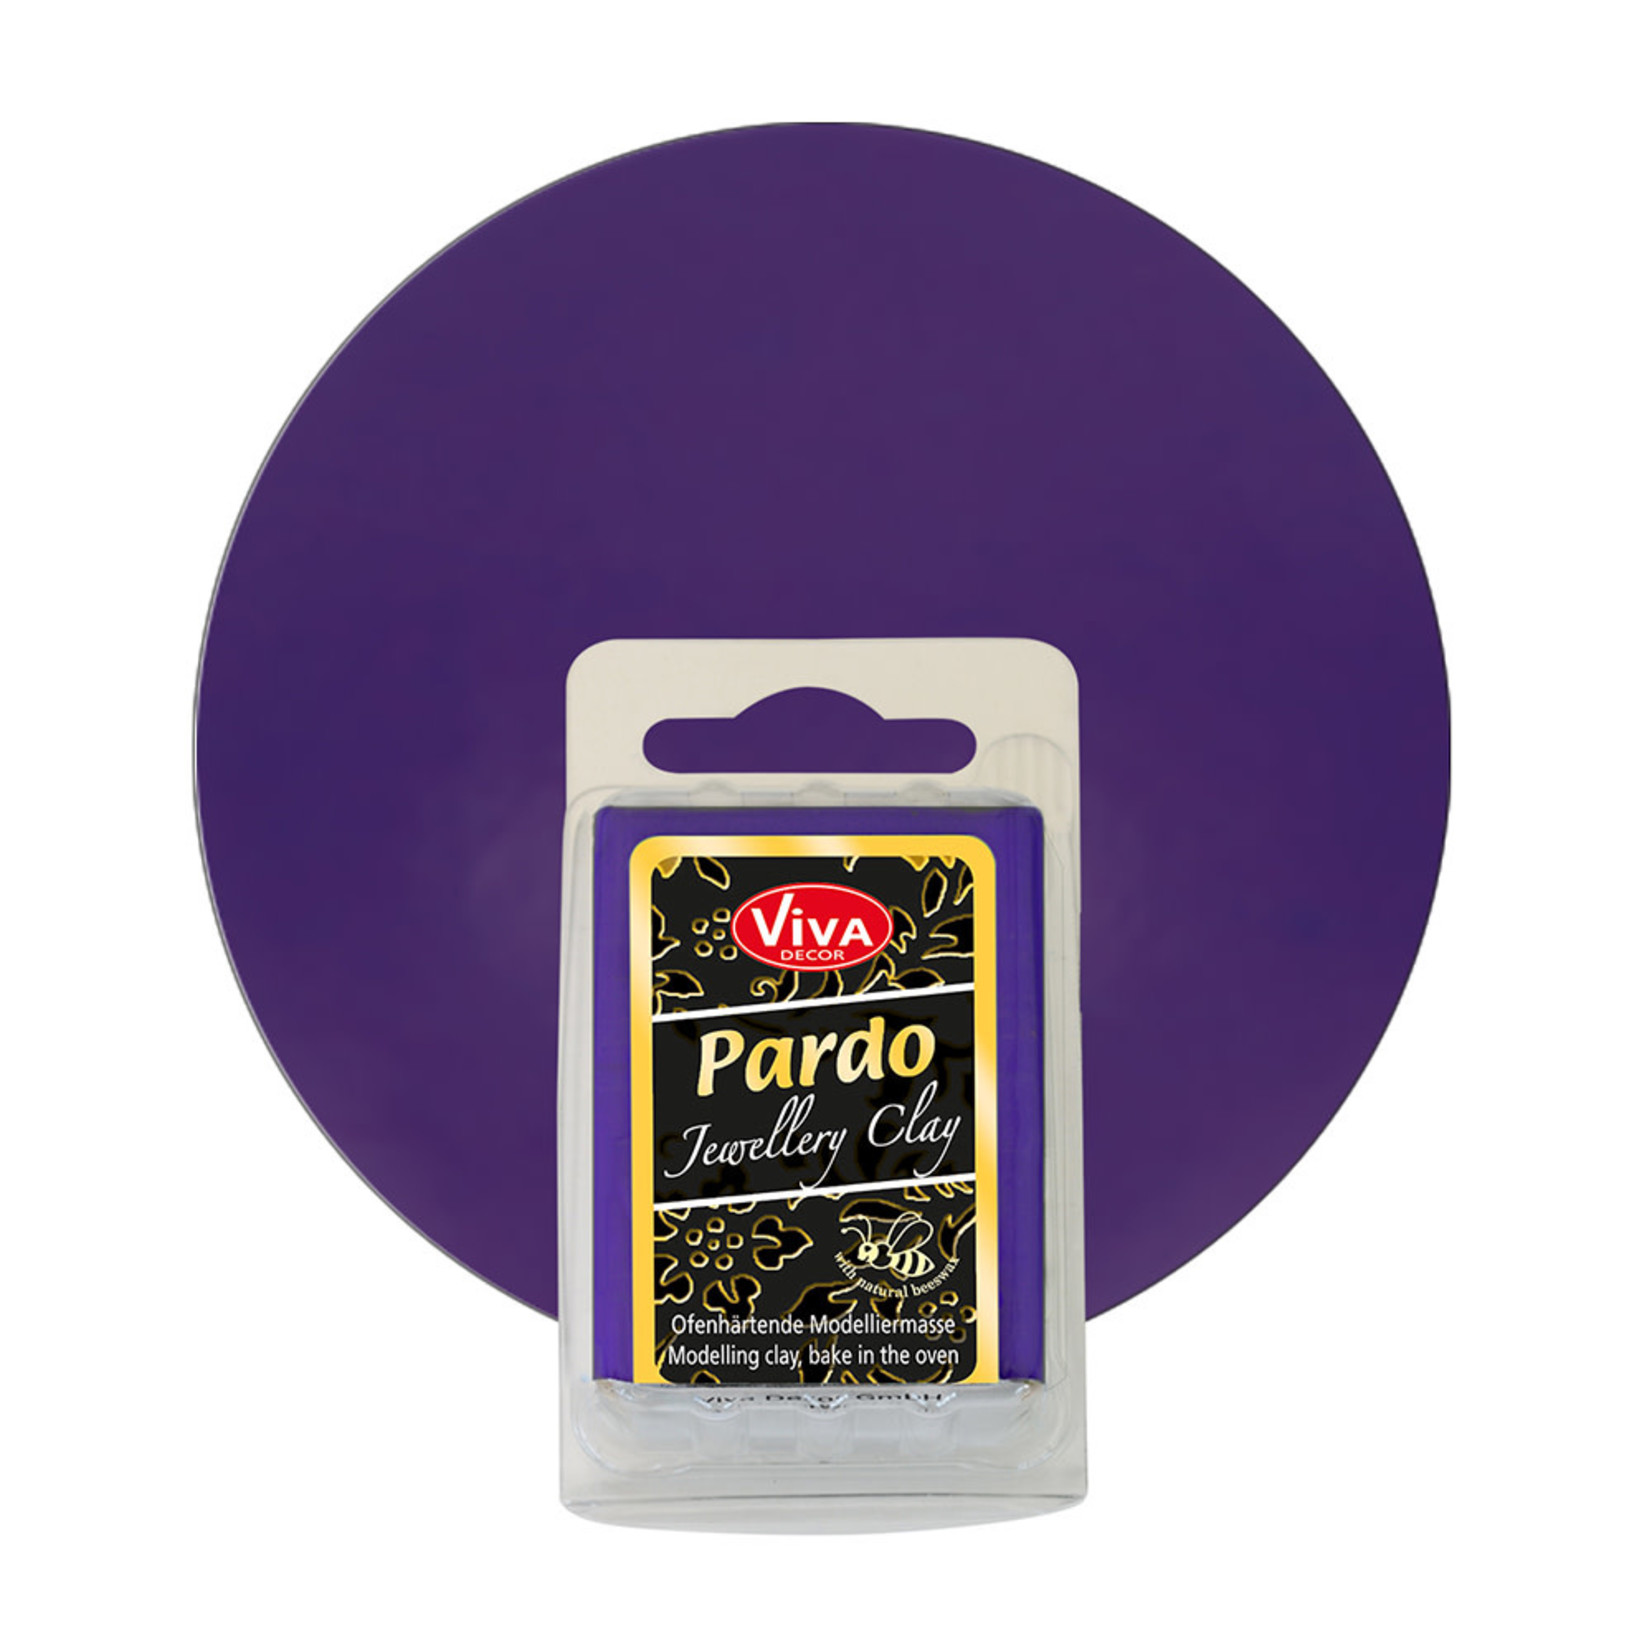 PARDO Jewelry Clay Lavender Jade, 56gr